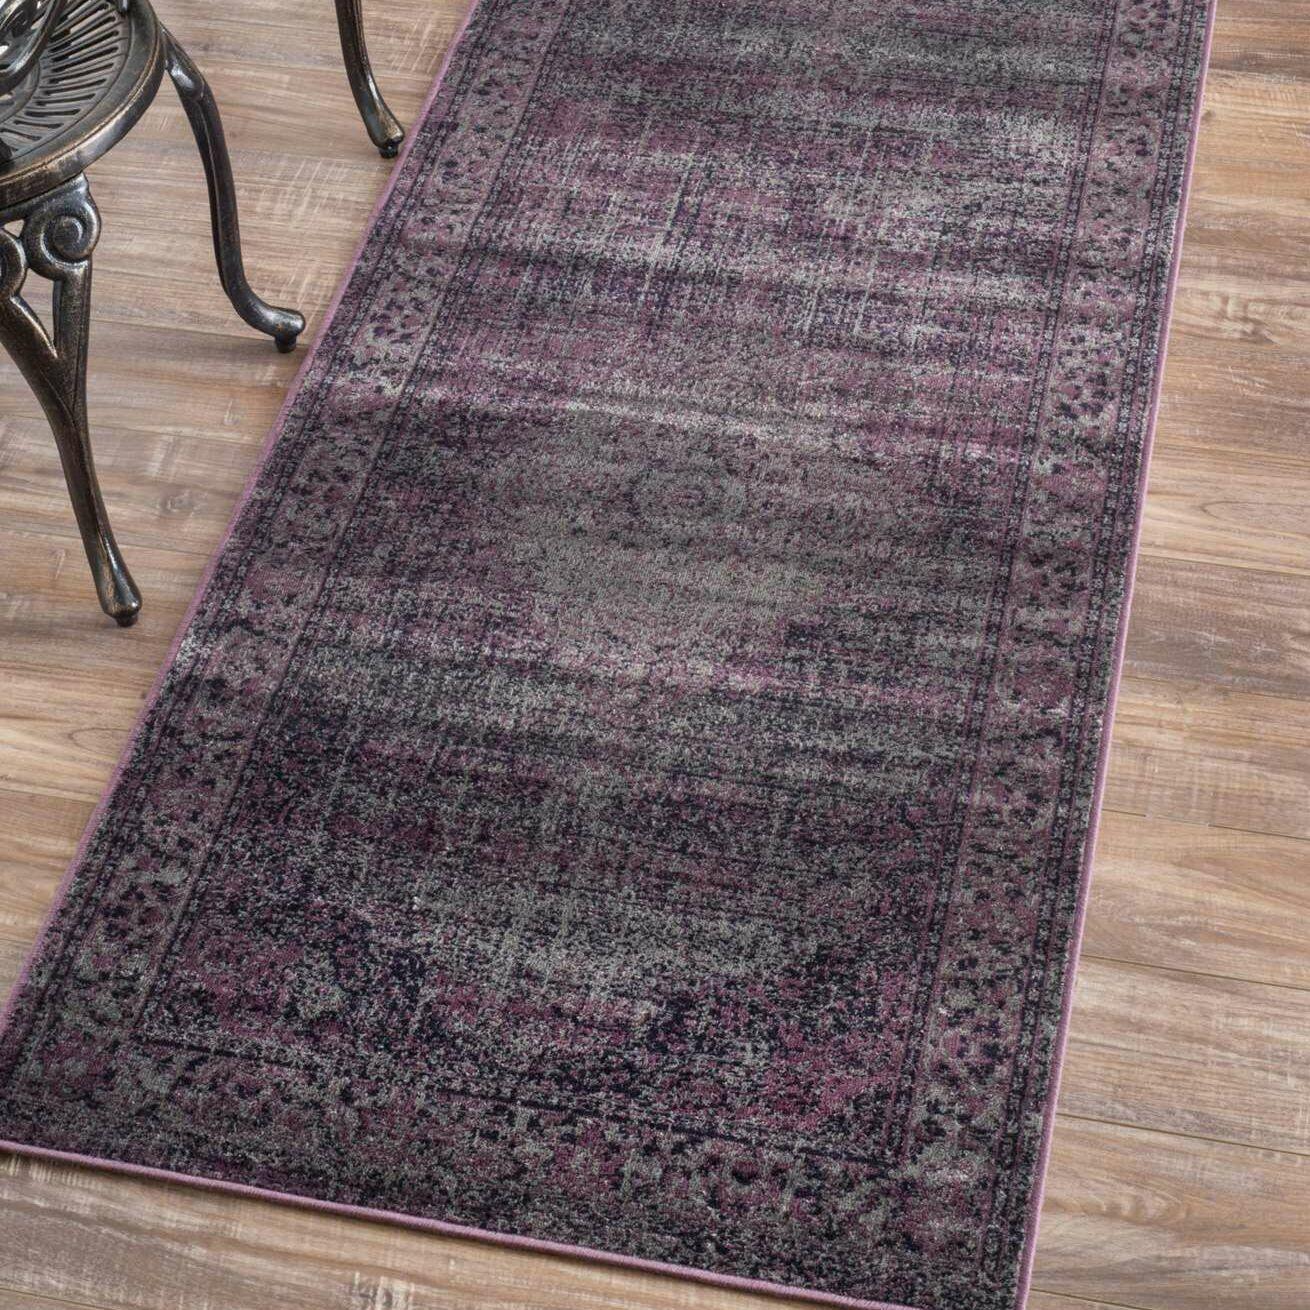 Faulkner Purple Area Rug Rug Size: Rectangle 5'2